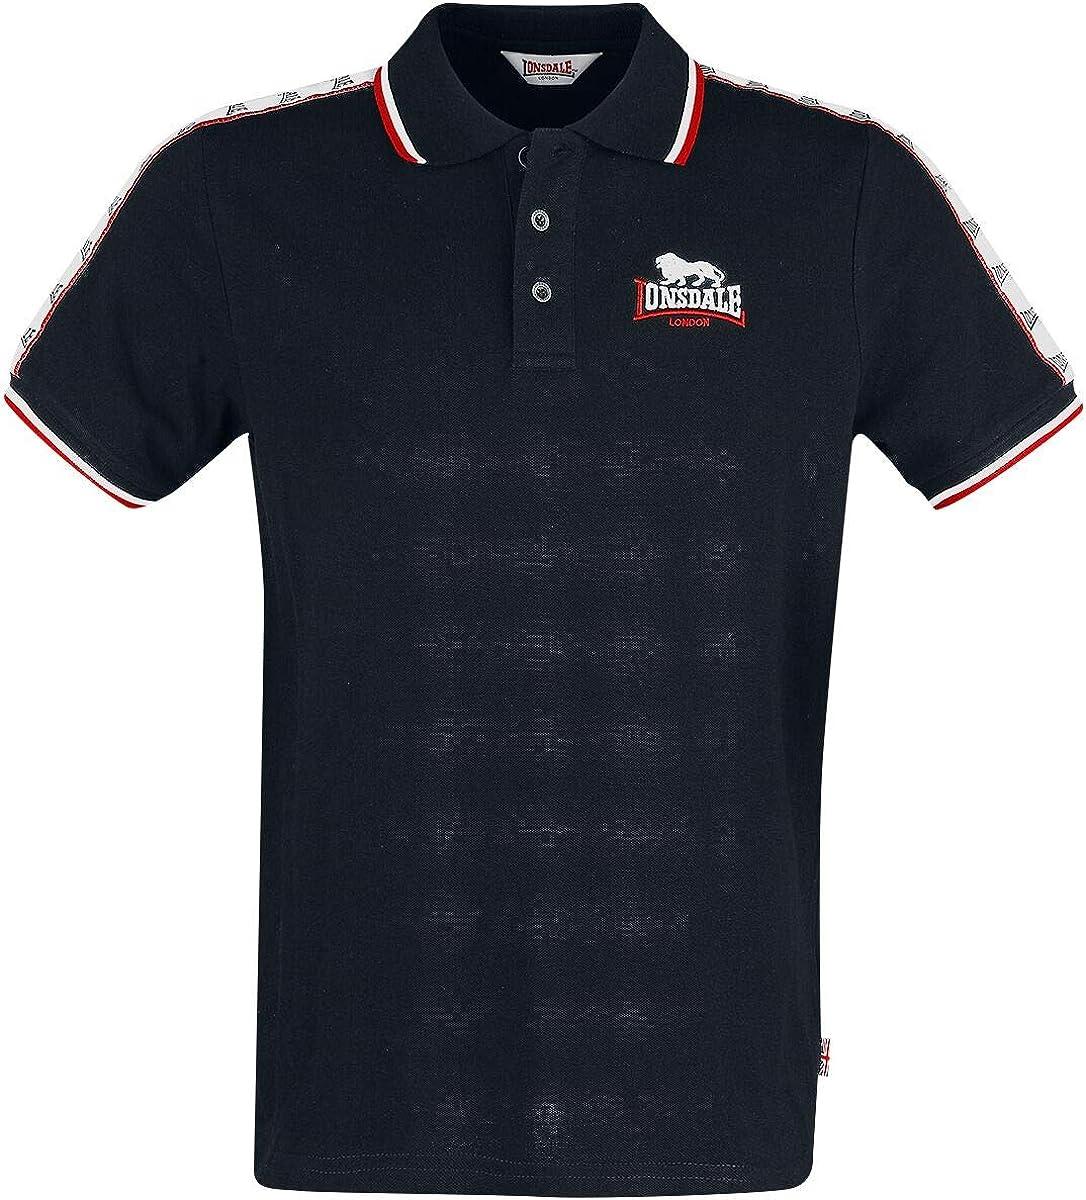 Lonsdale Hunstanton Camisa Polo para Hombre